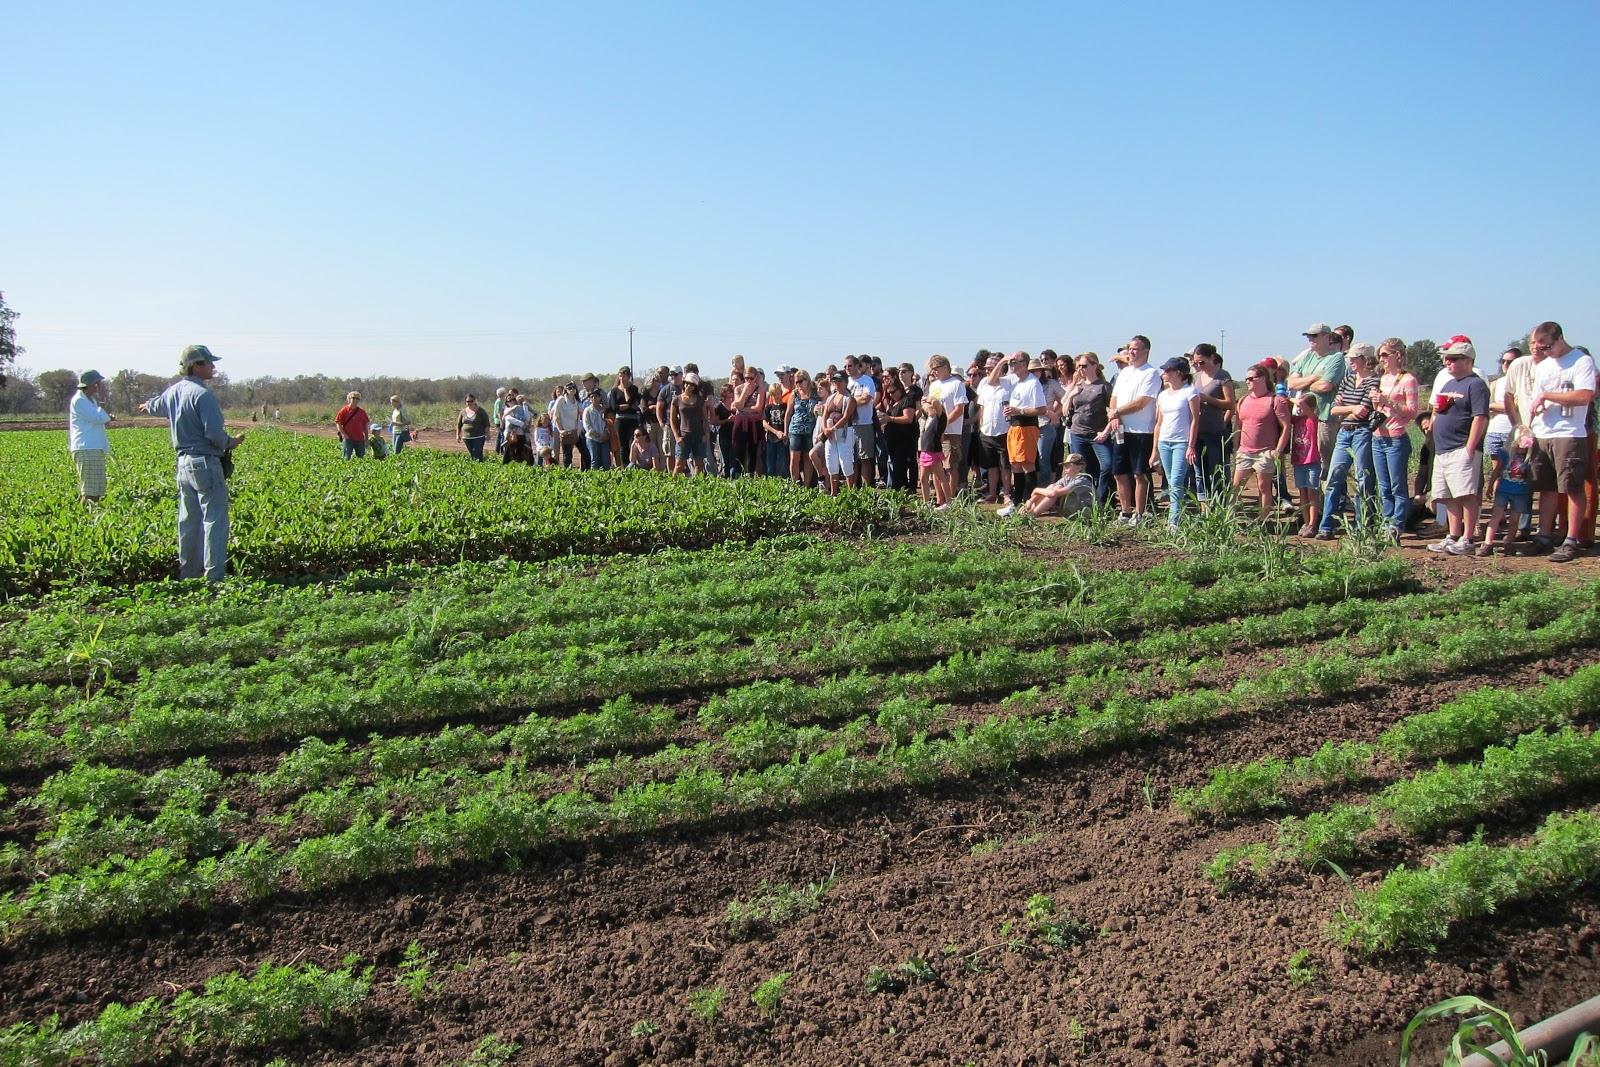 jbg farm tour 11-4-12 (3).jpg